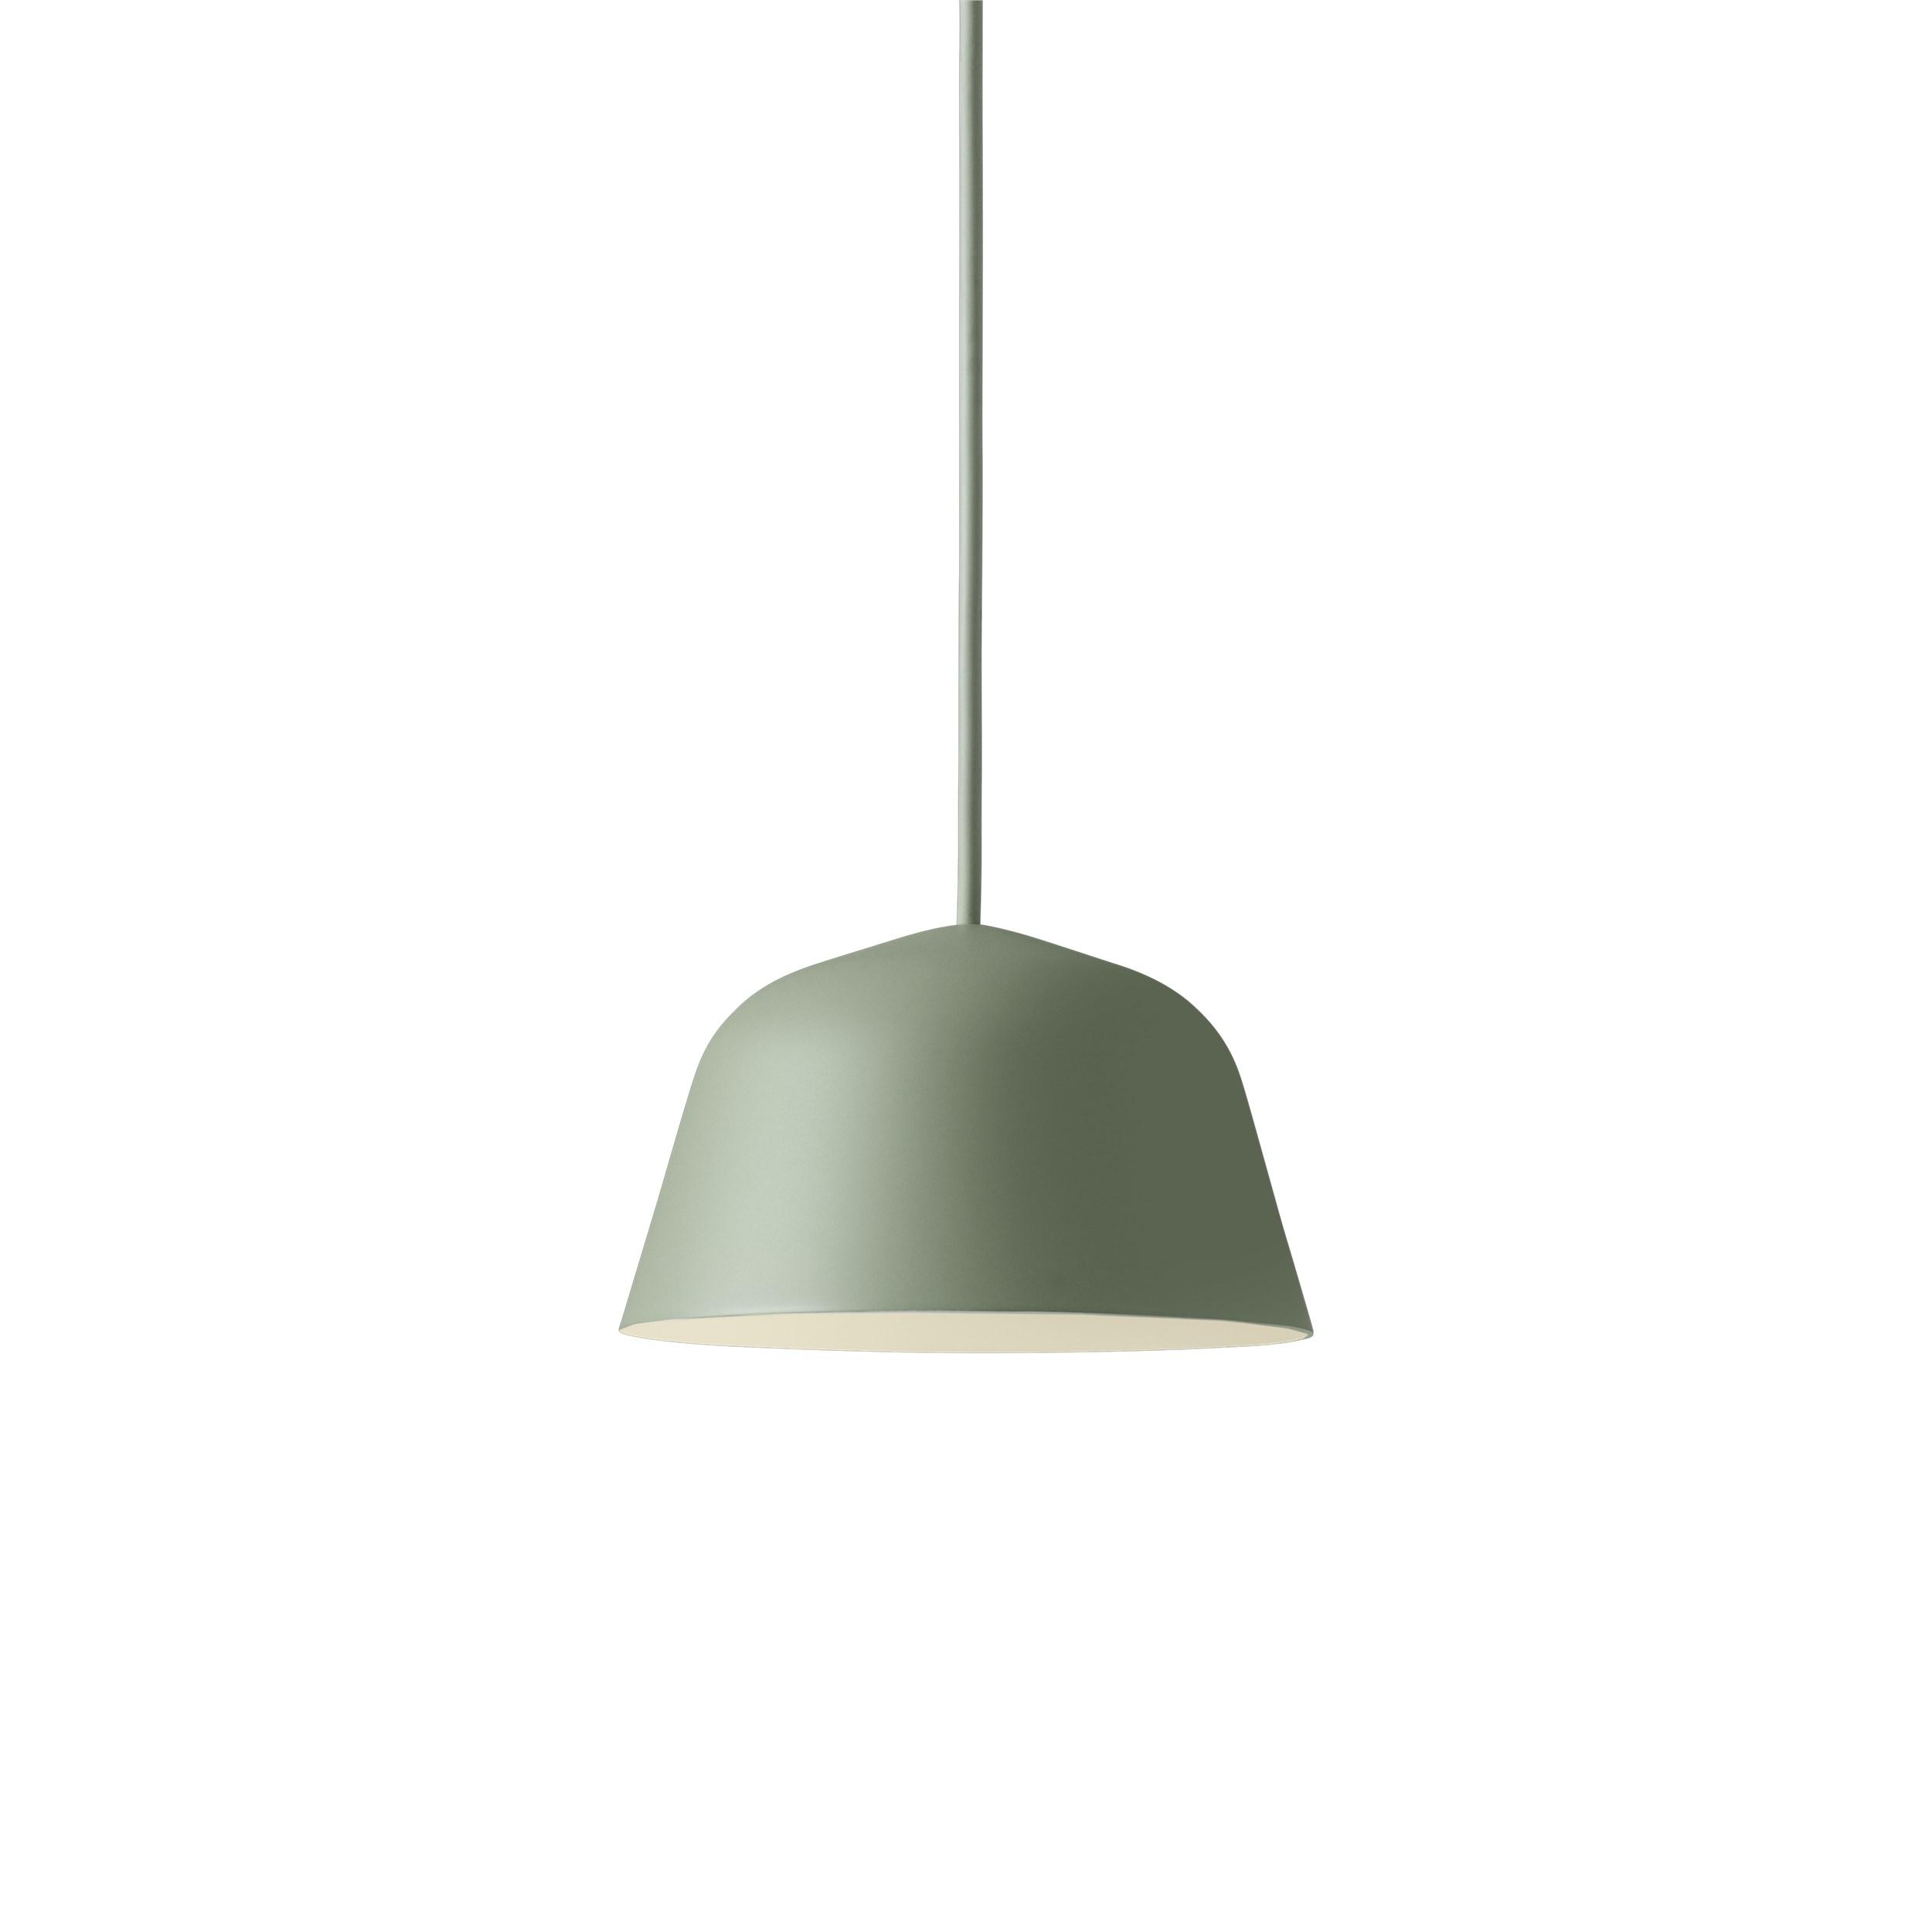 Ambit lamp 16,5 cm dusty green